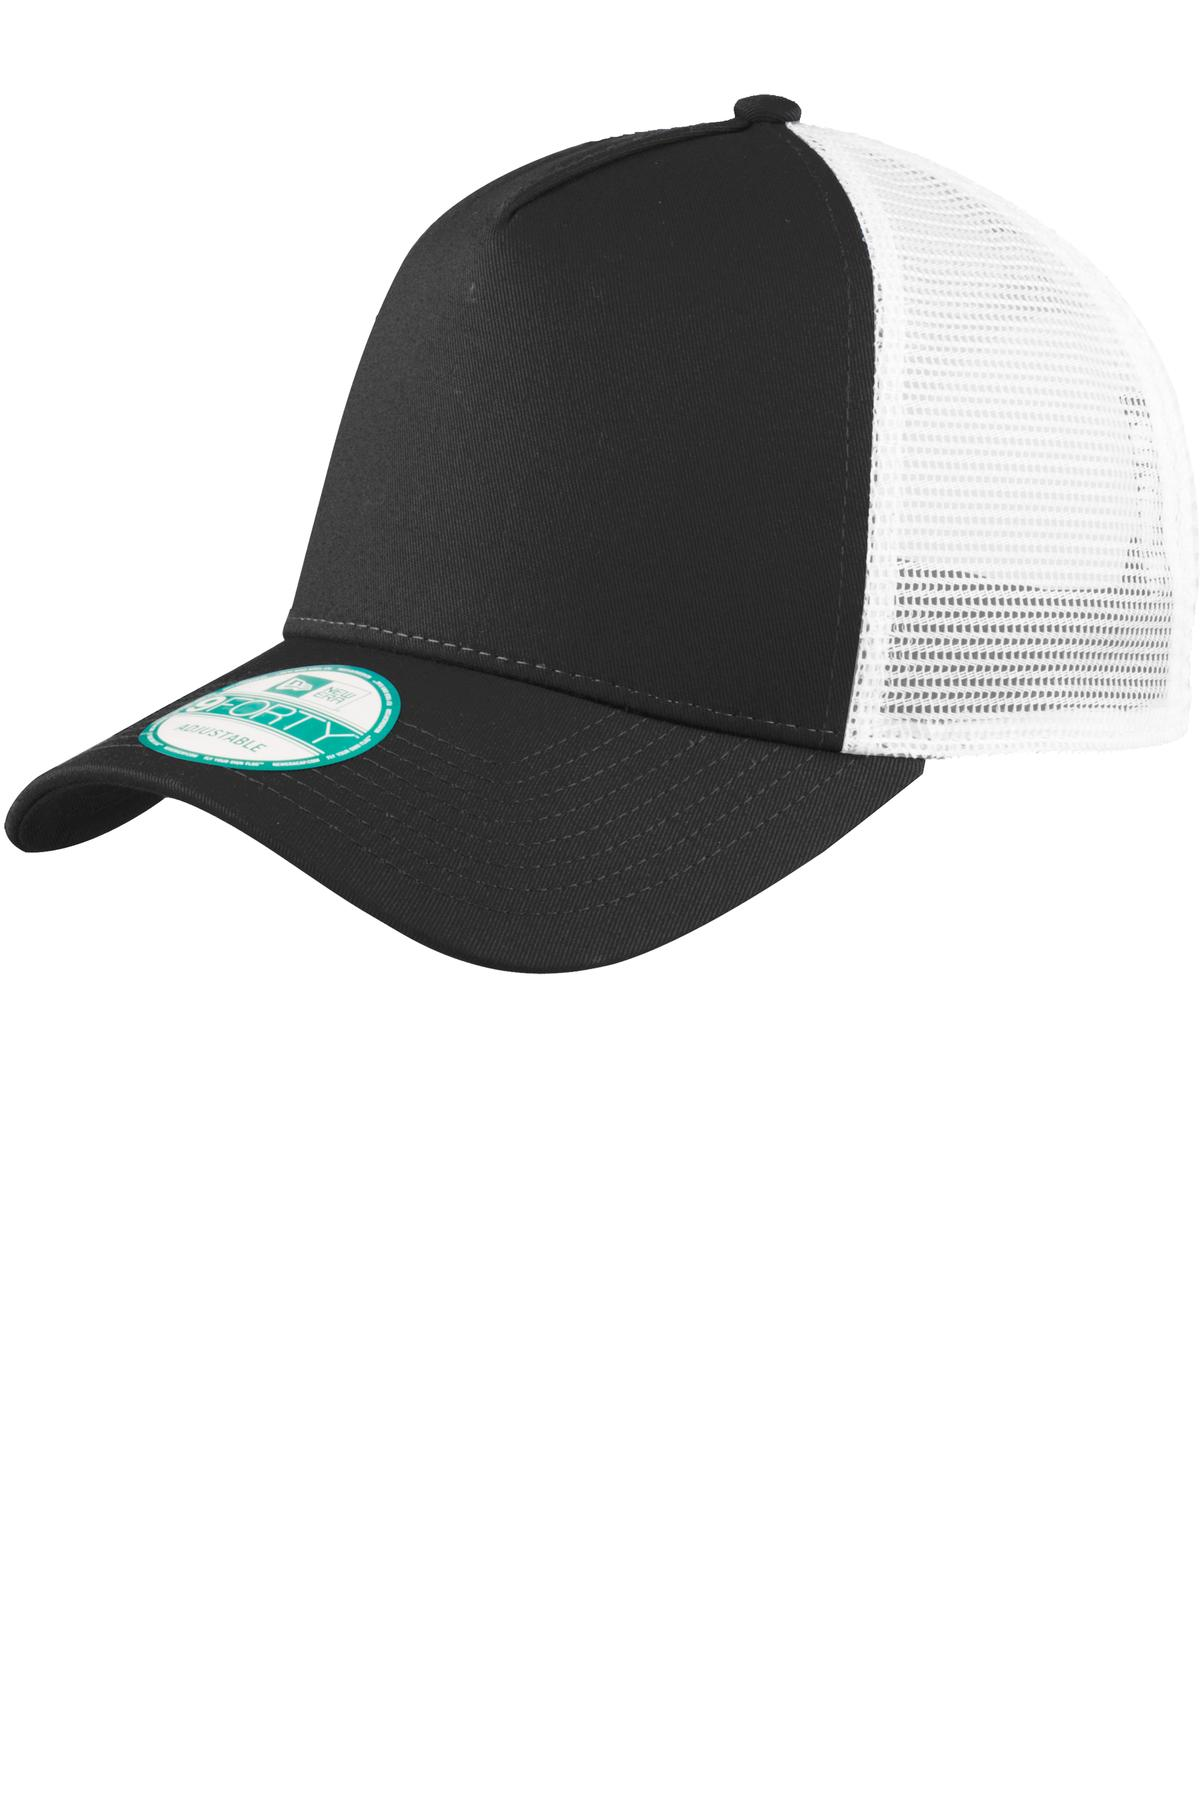 New Era® NE205 - Snapback Trucker Cap